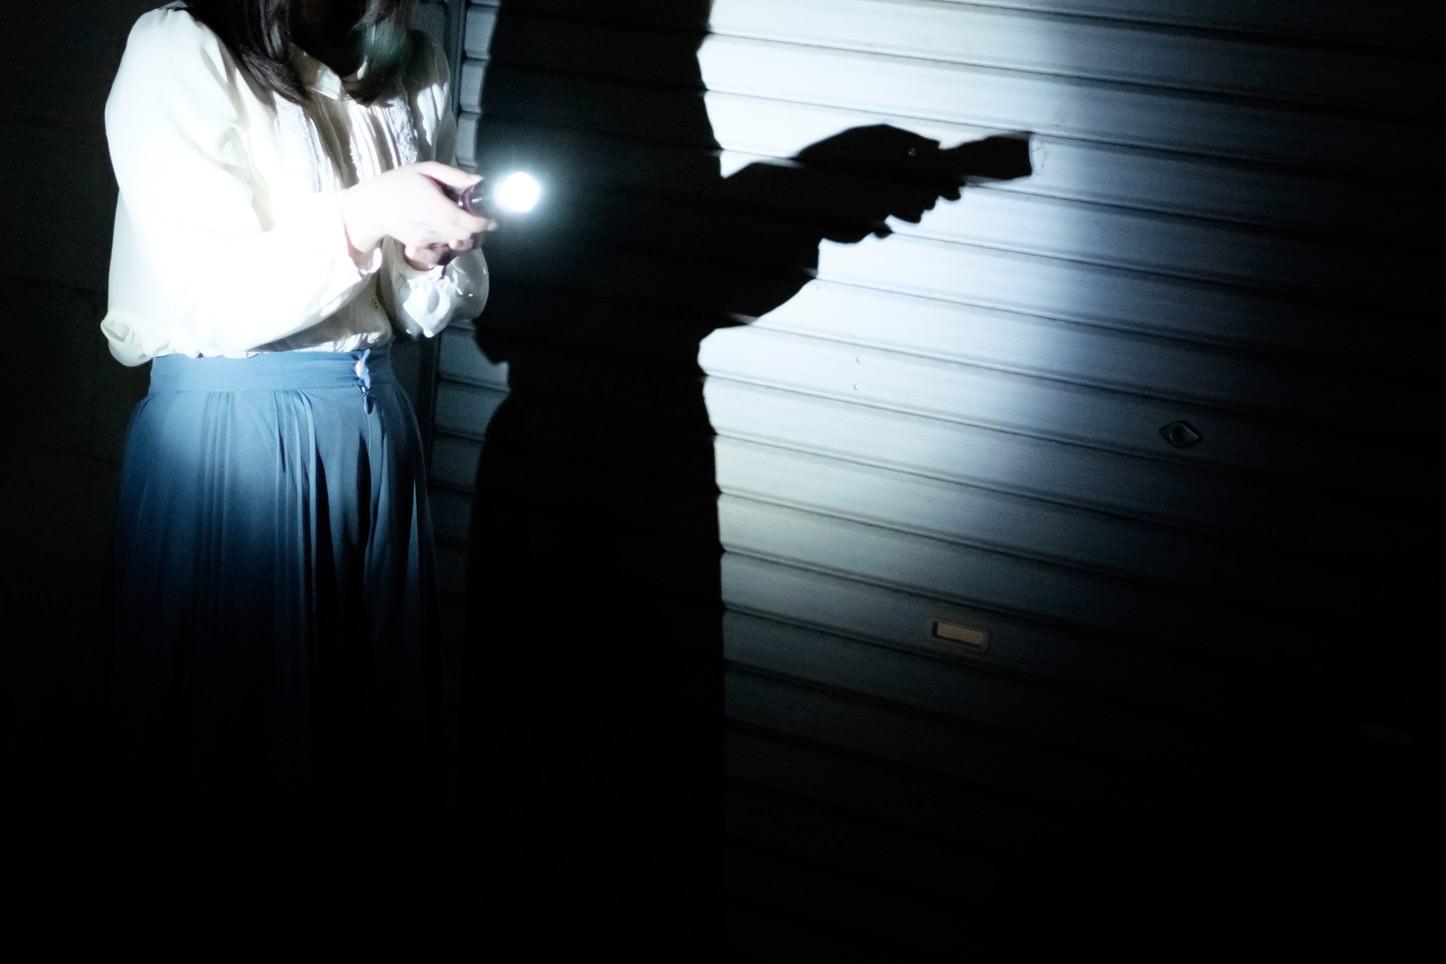 Pakutaso-Horror-Free-Stock-Photos-59.jpg